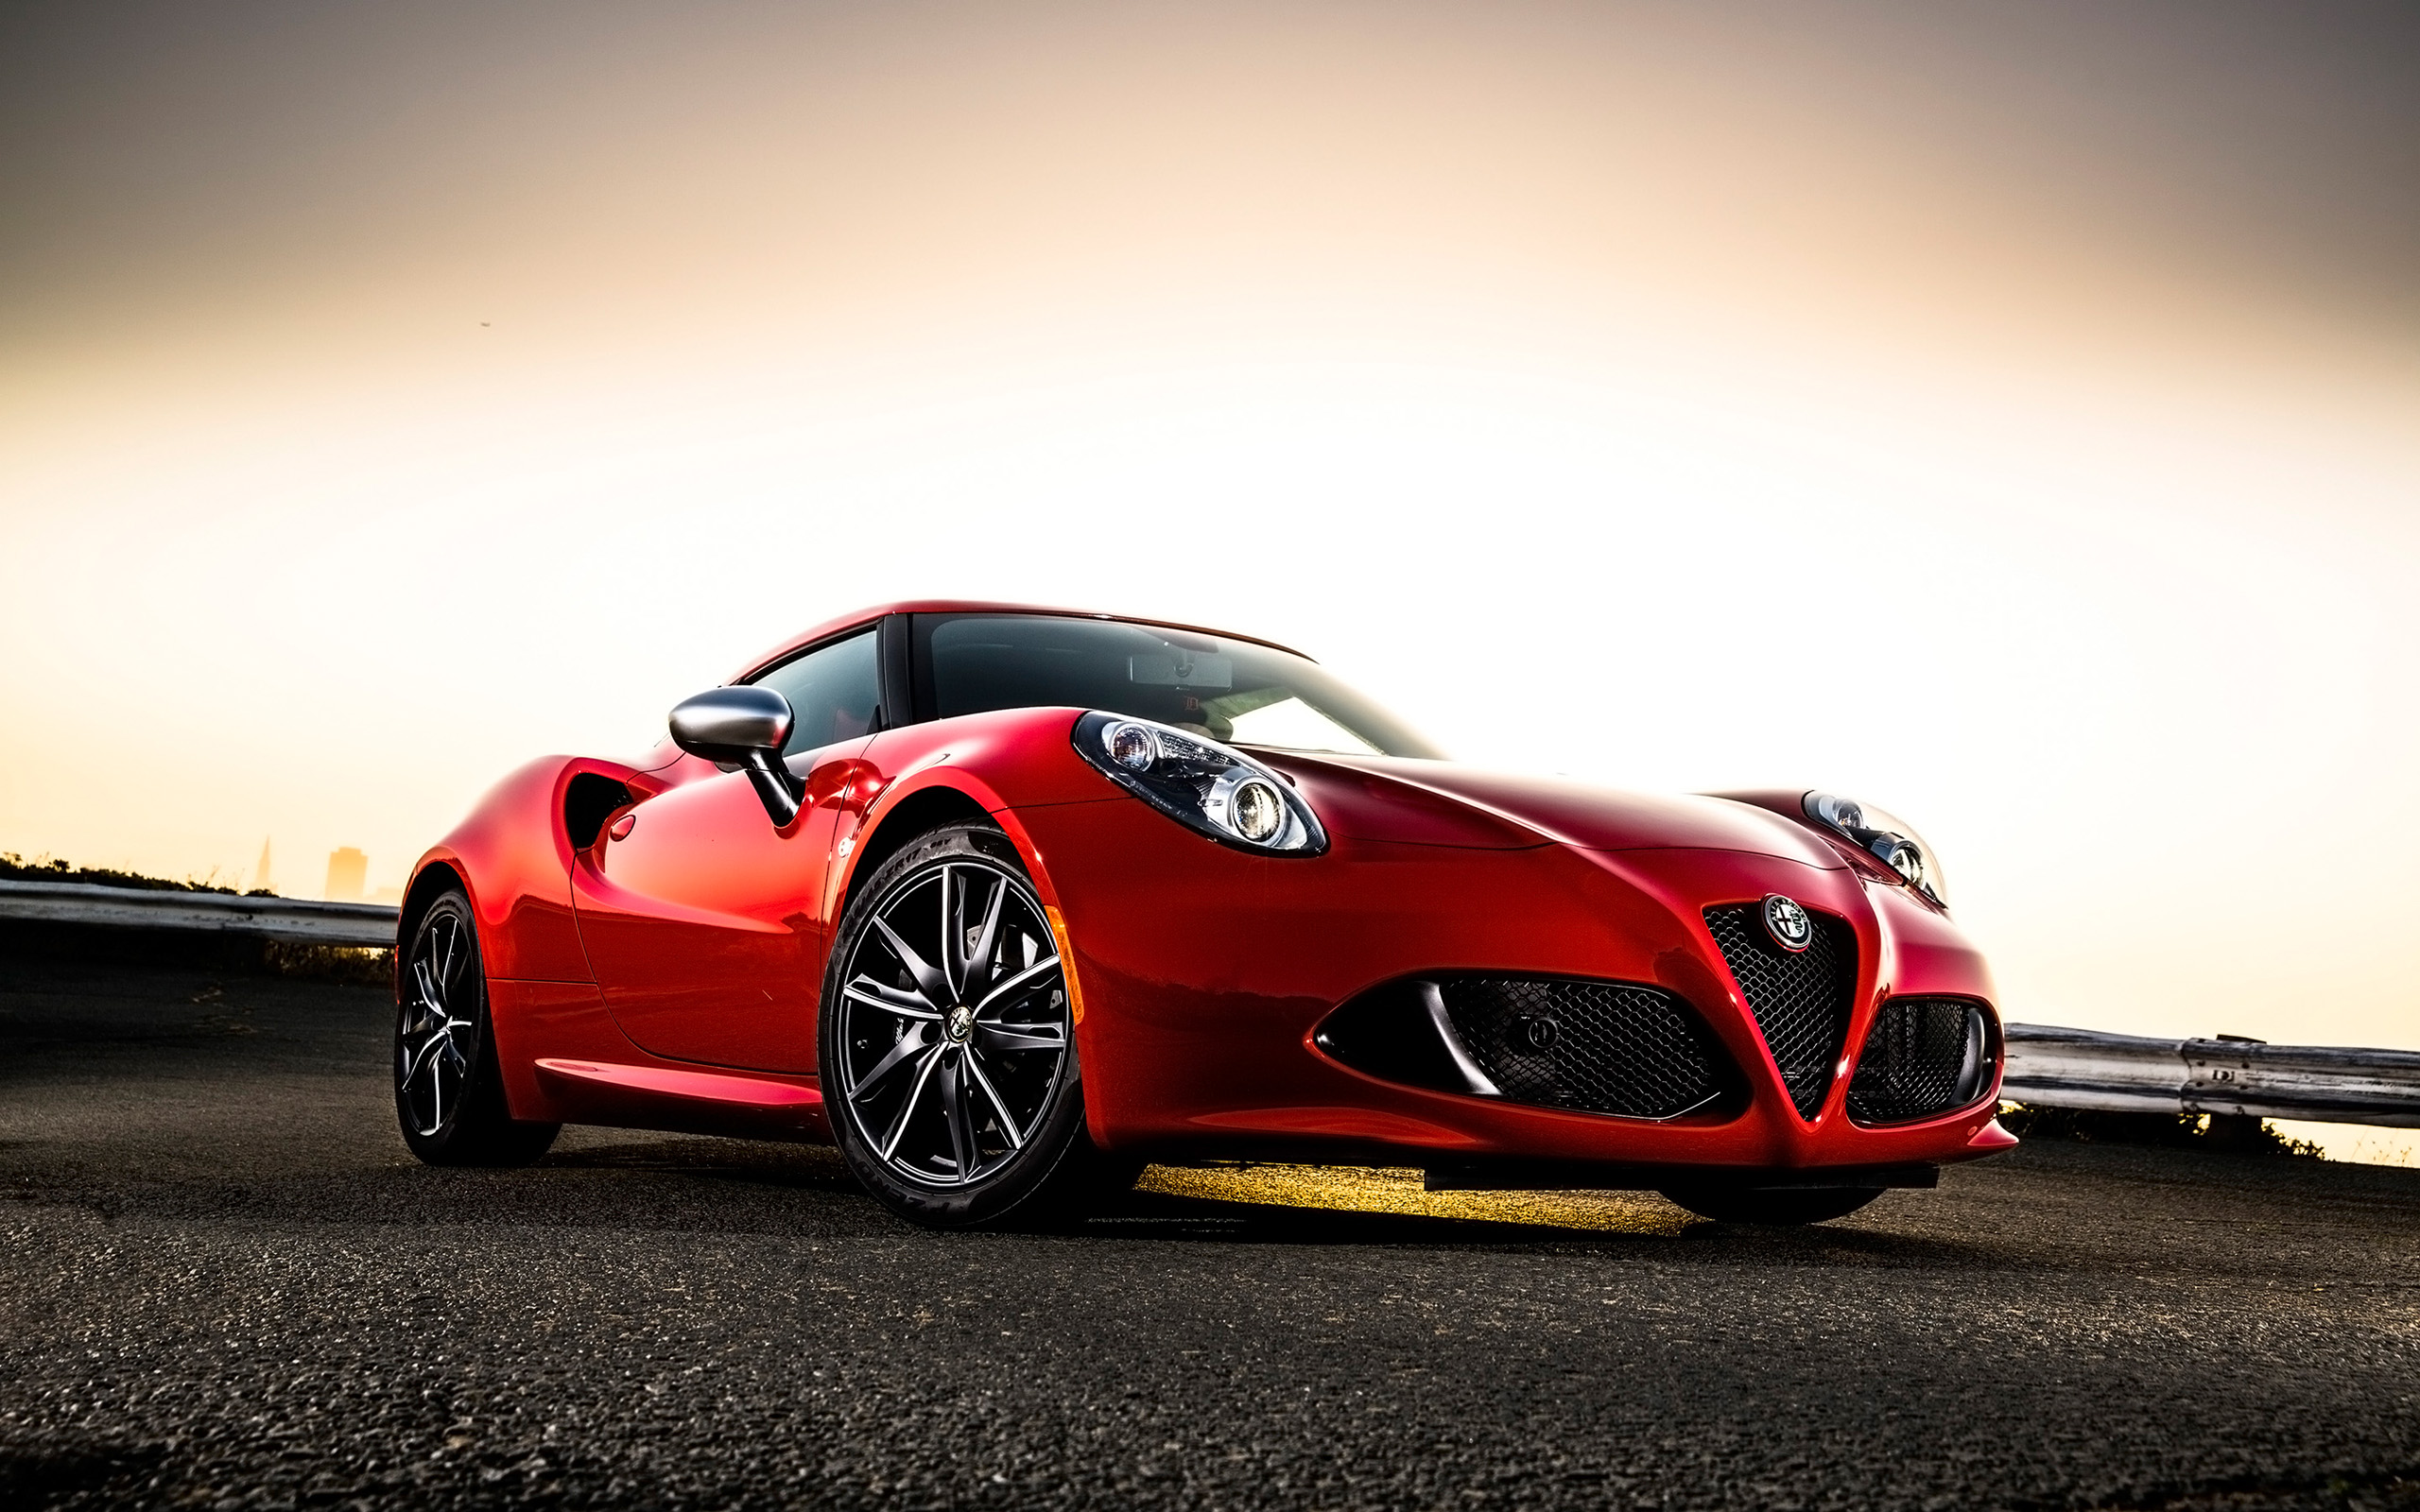 2016 Alfa Romeo 4c Wallpaper Hd Car Wallpapers Id 6648